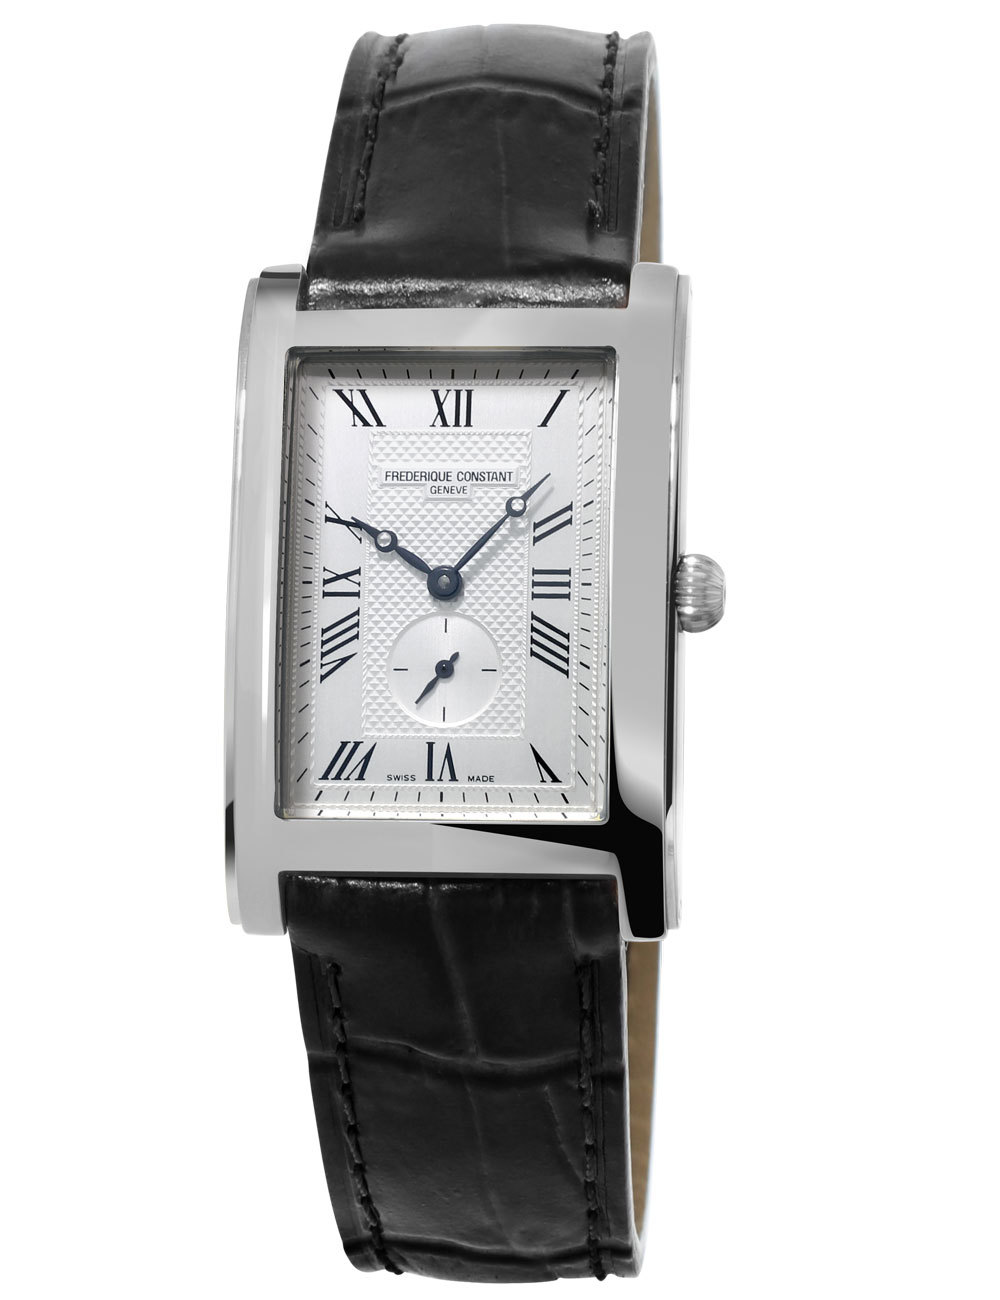 Часы женские Frederique Constant FC-235MC26 Caree